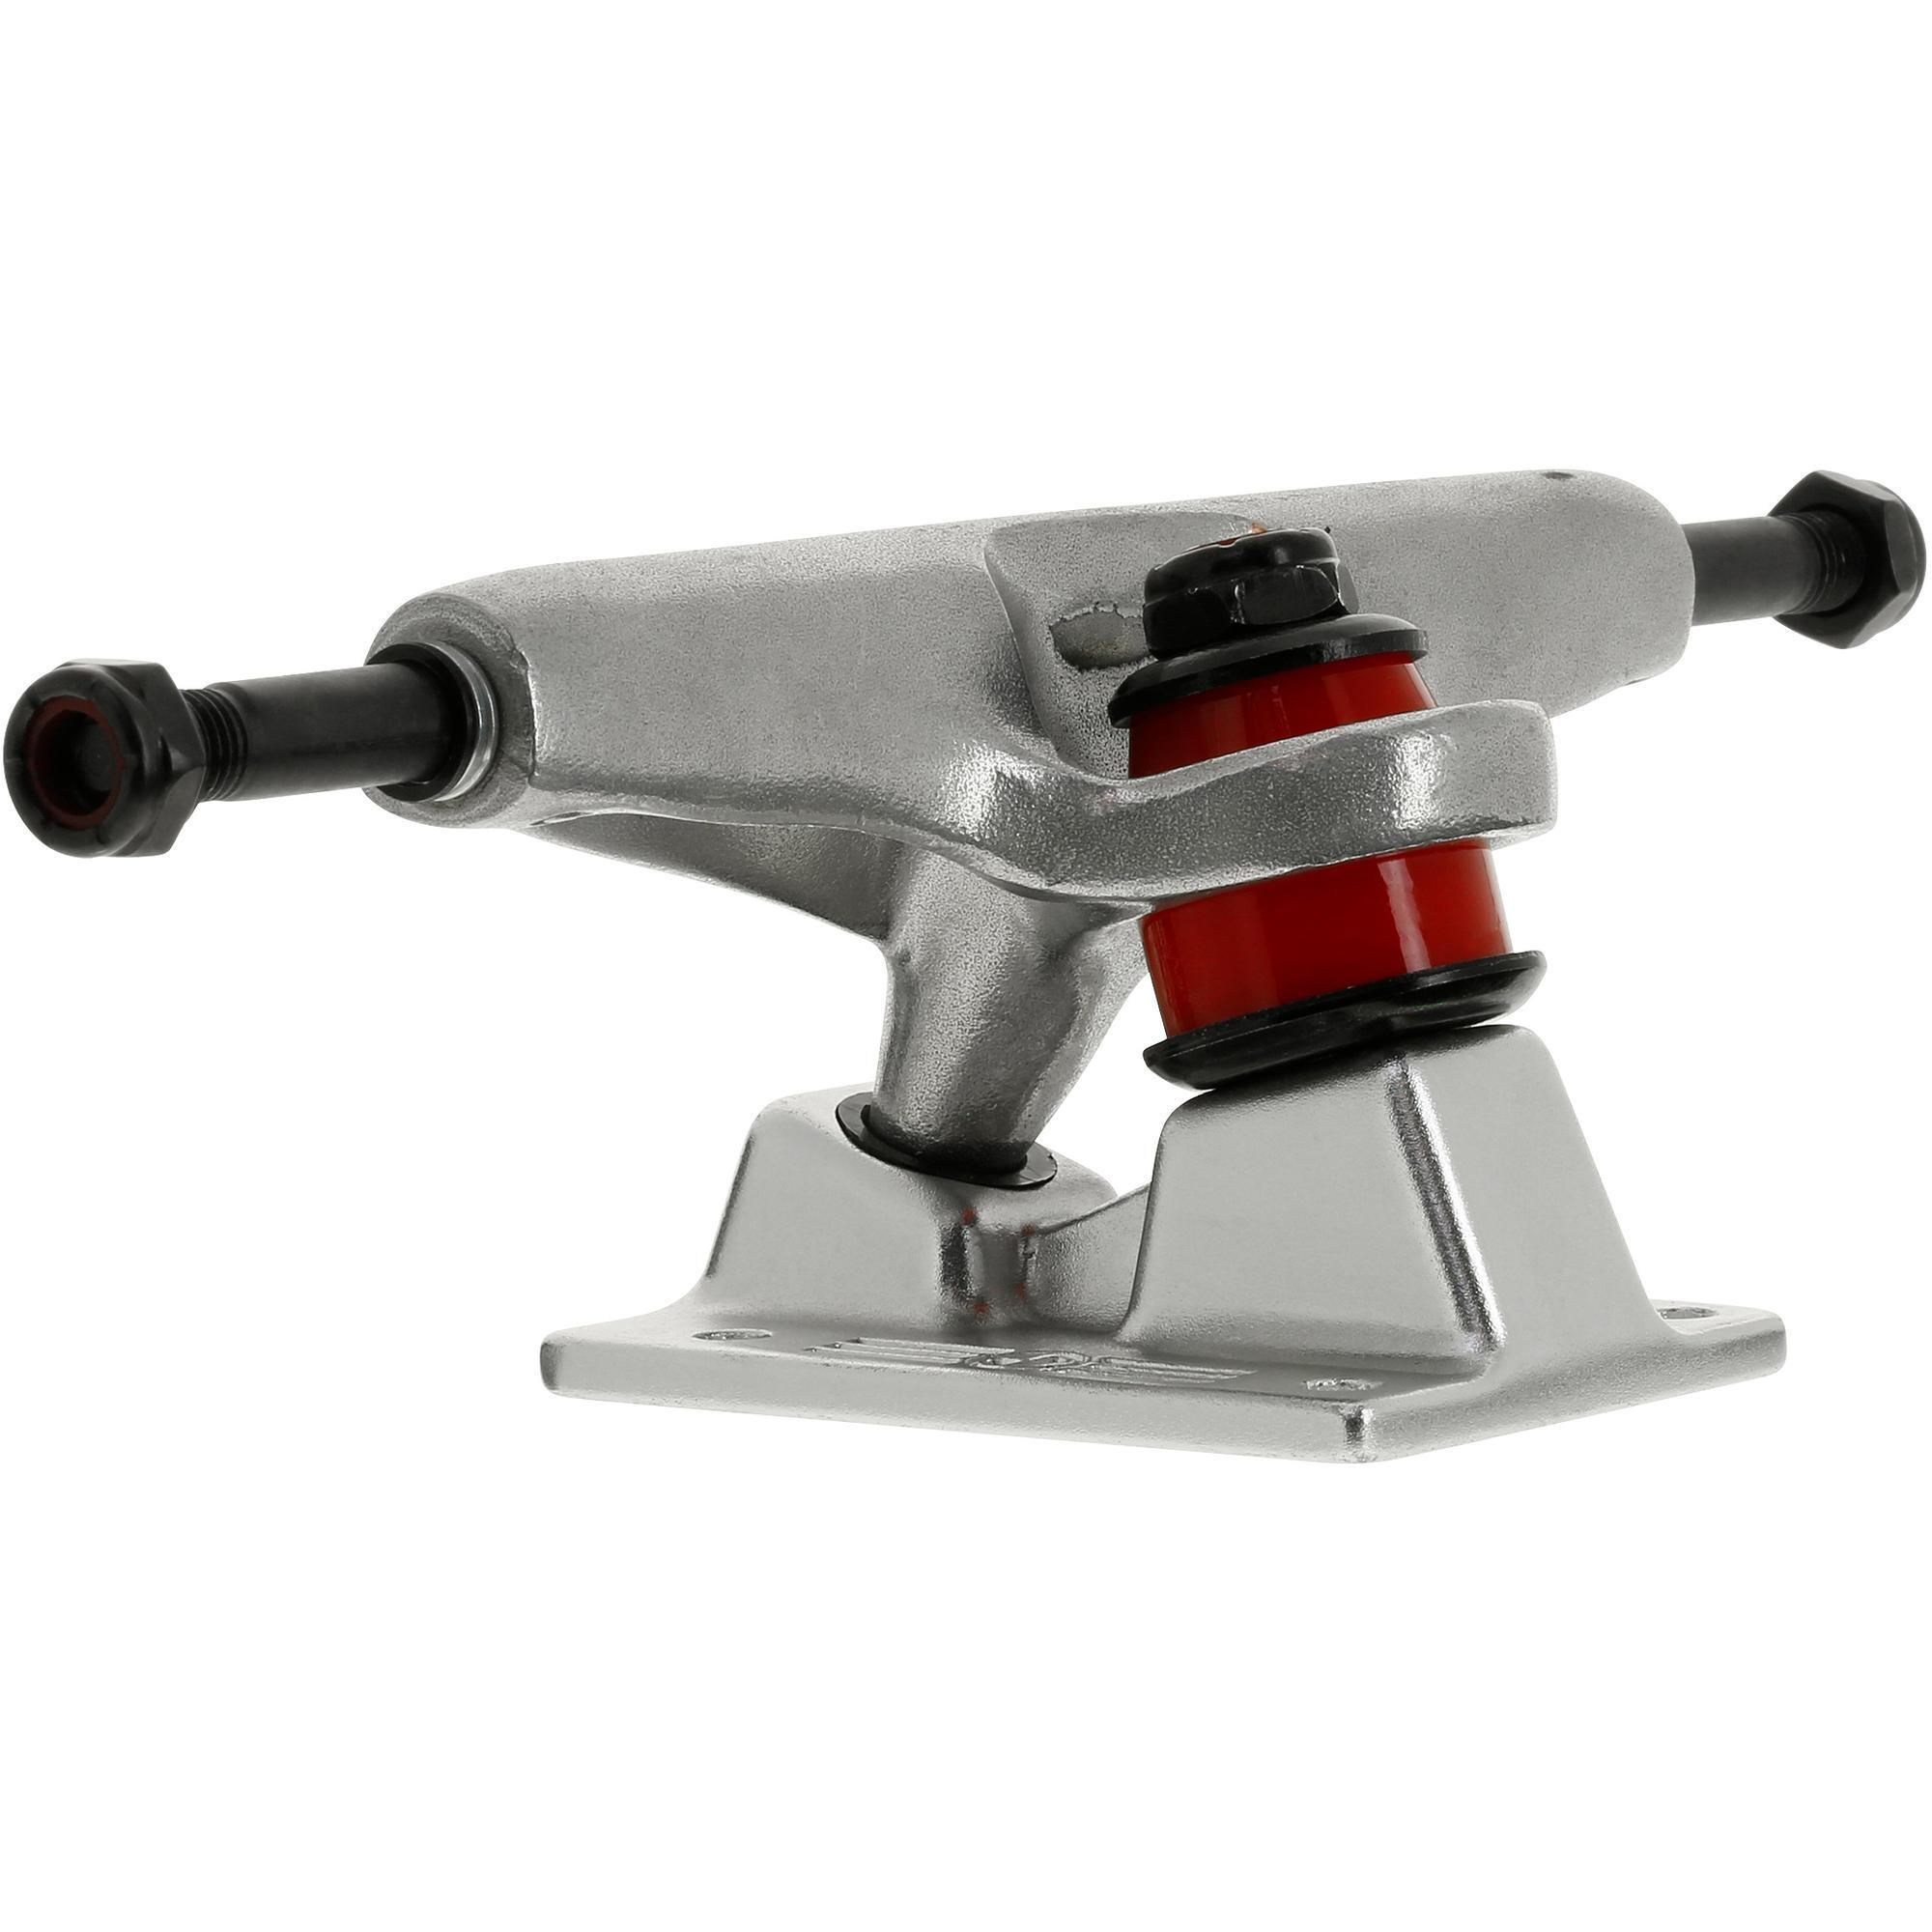 "Oxelo 1 skate truck Fury forged baseplate maat 8"" (20,32 mm) kopen"